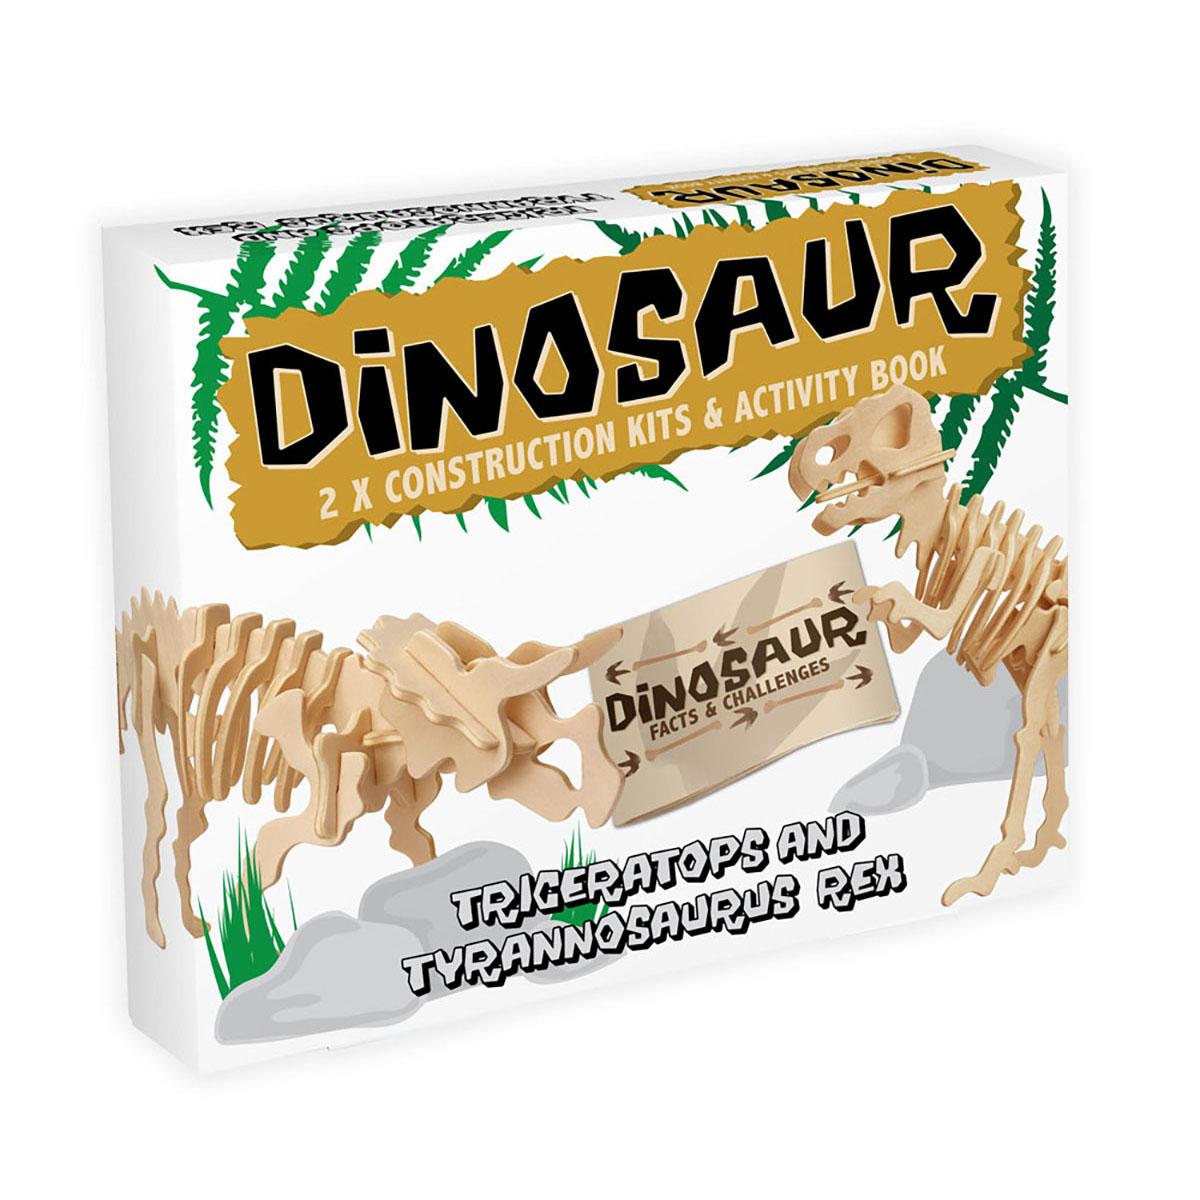 Dinosaur - Triceratops and Tyrannosaurus